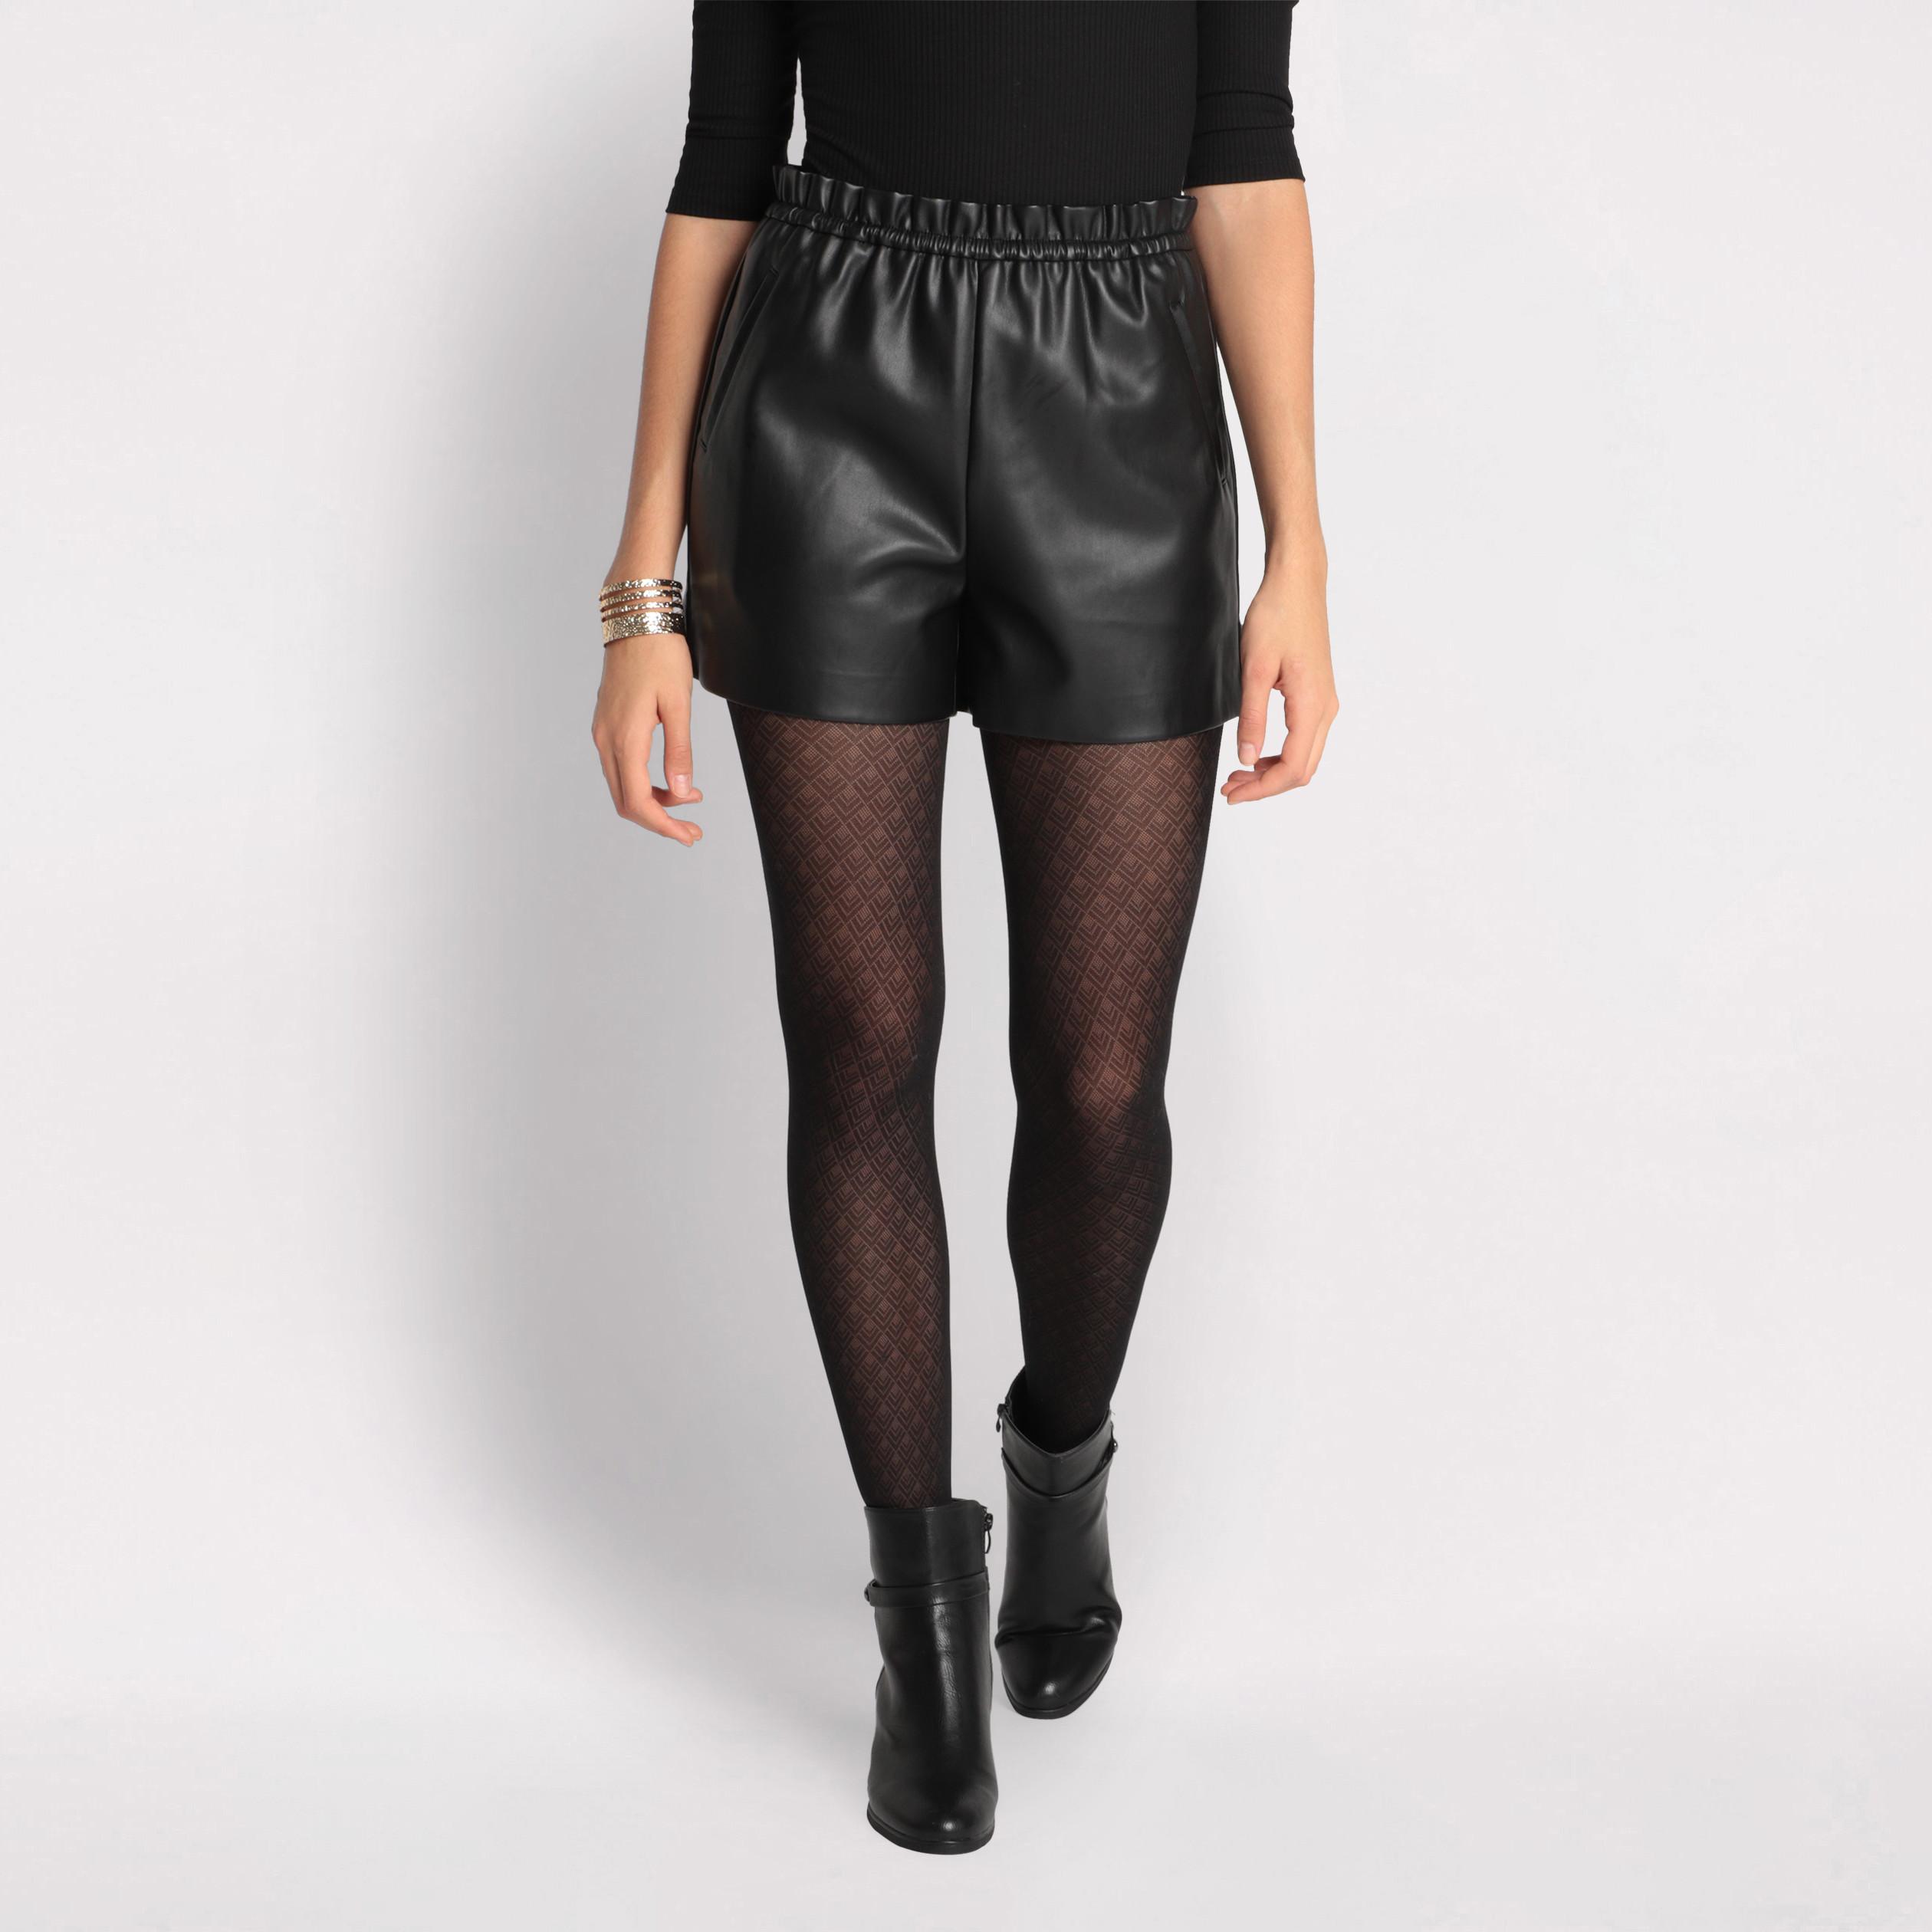 Short simili cuir noir femme   Vib's